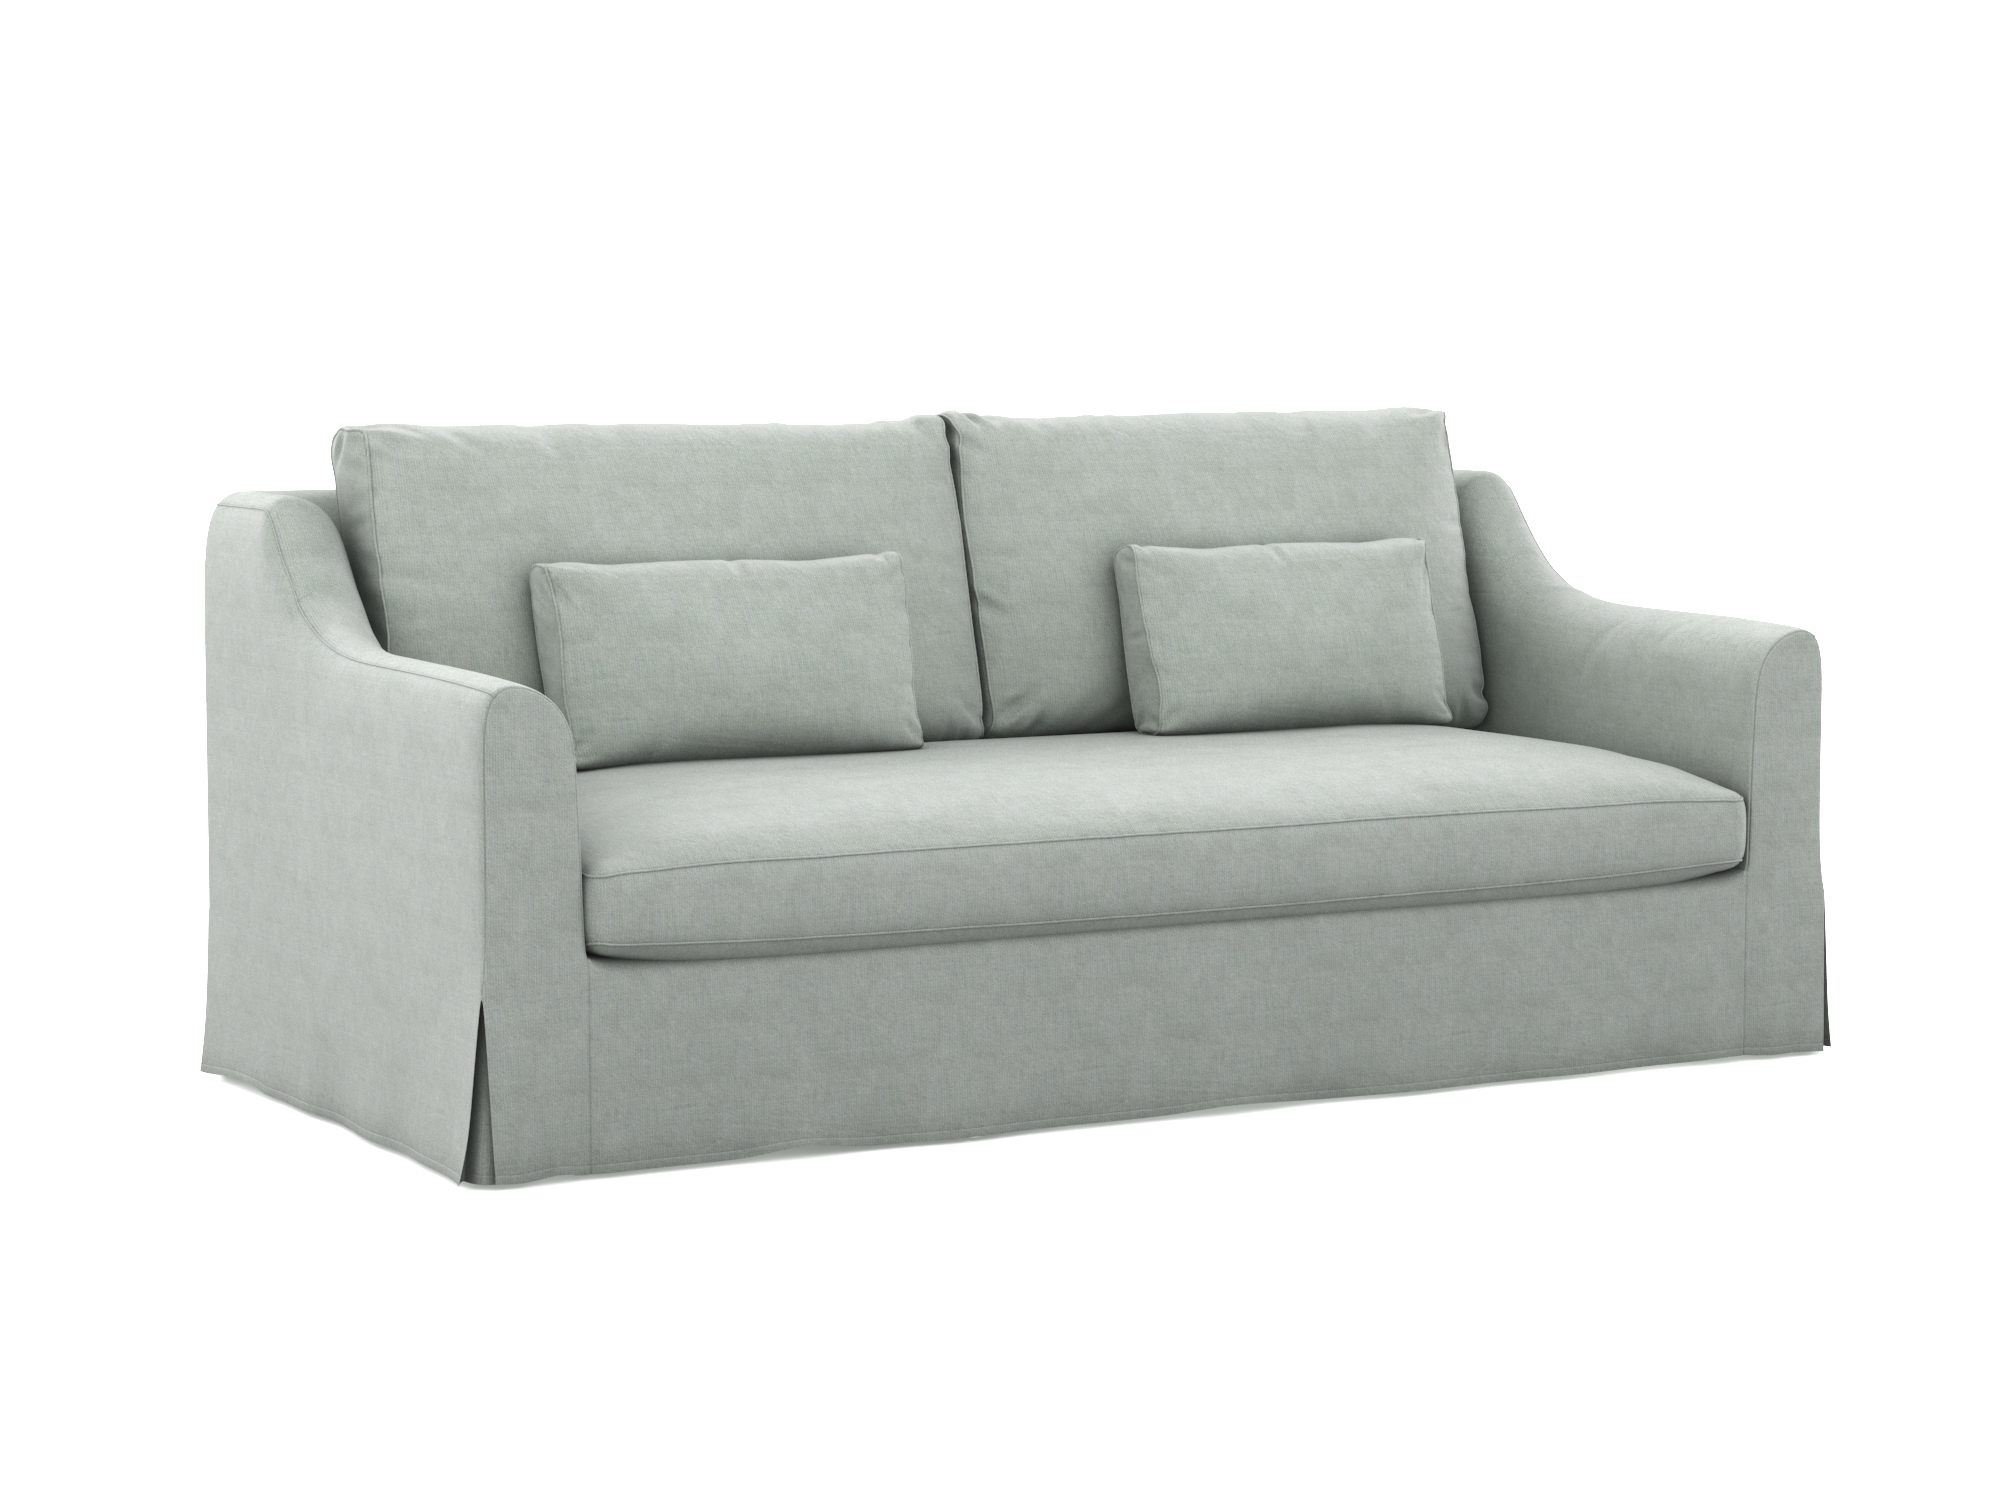 Färlöv 3-Sitzer Sofabezug